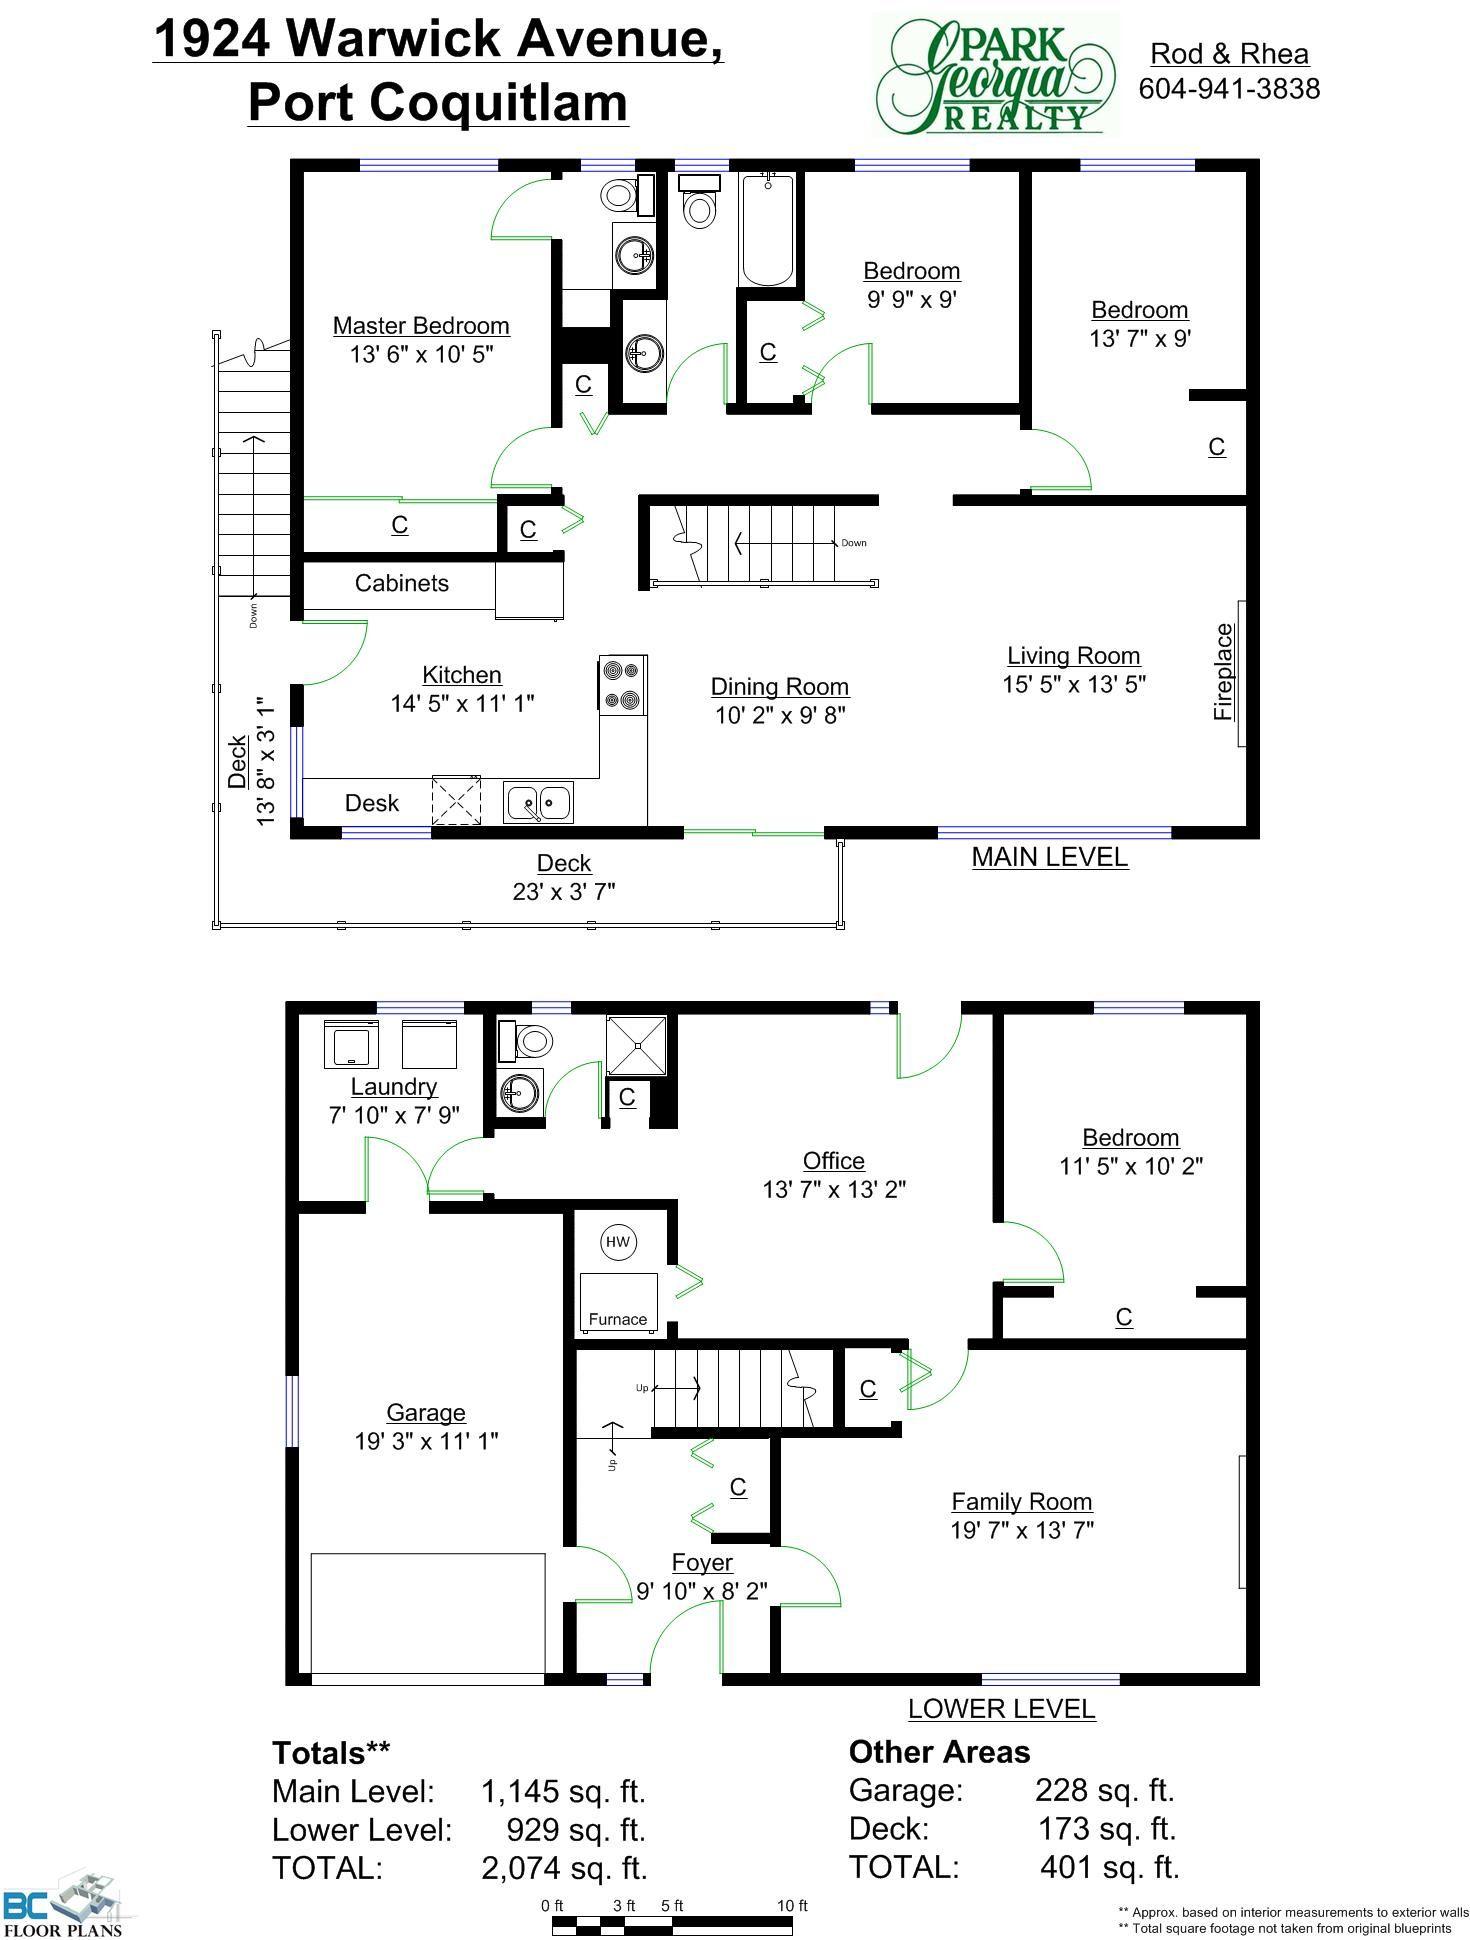 Pin On Listing Floor Plans